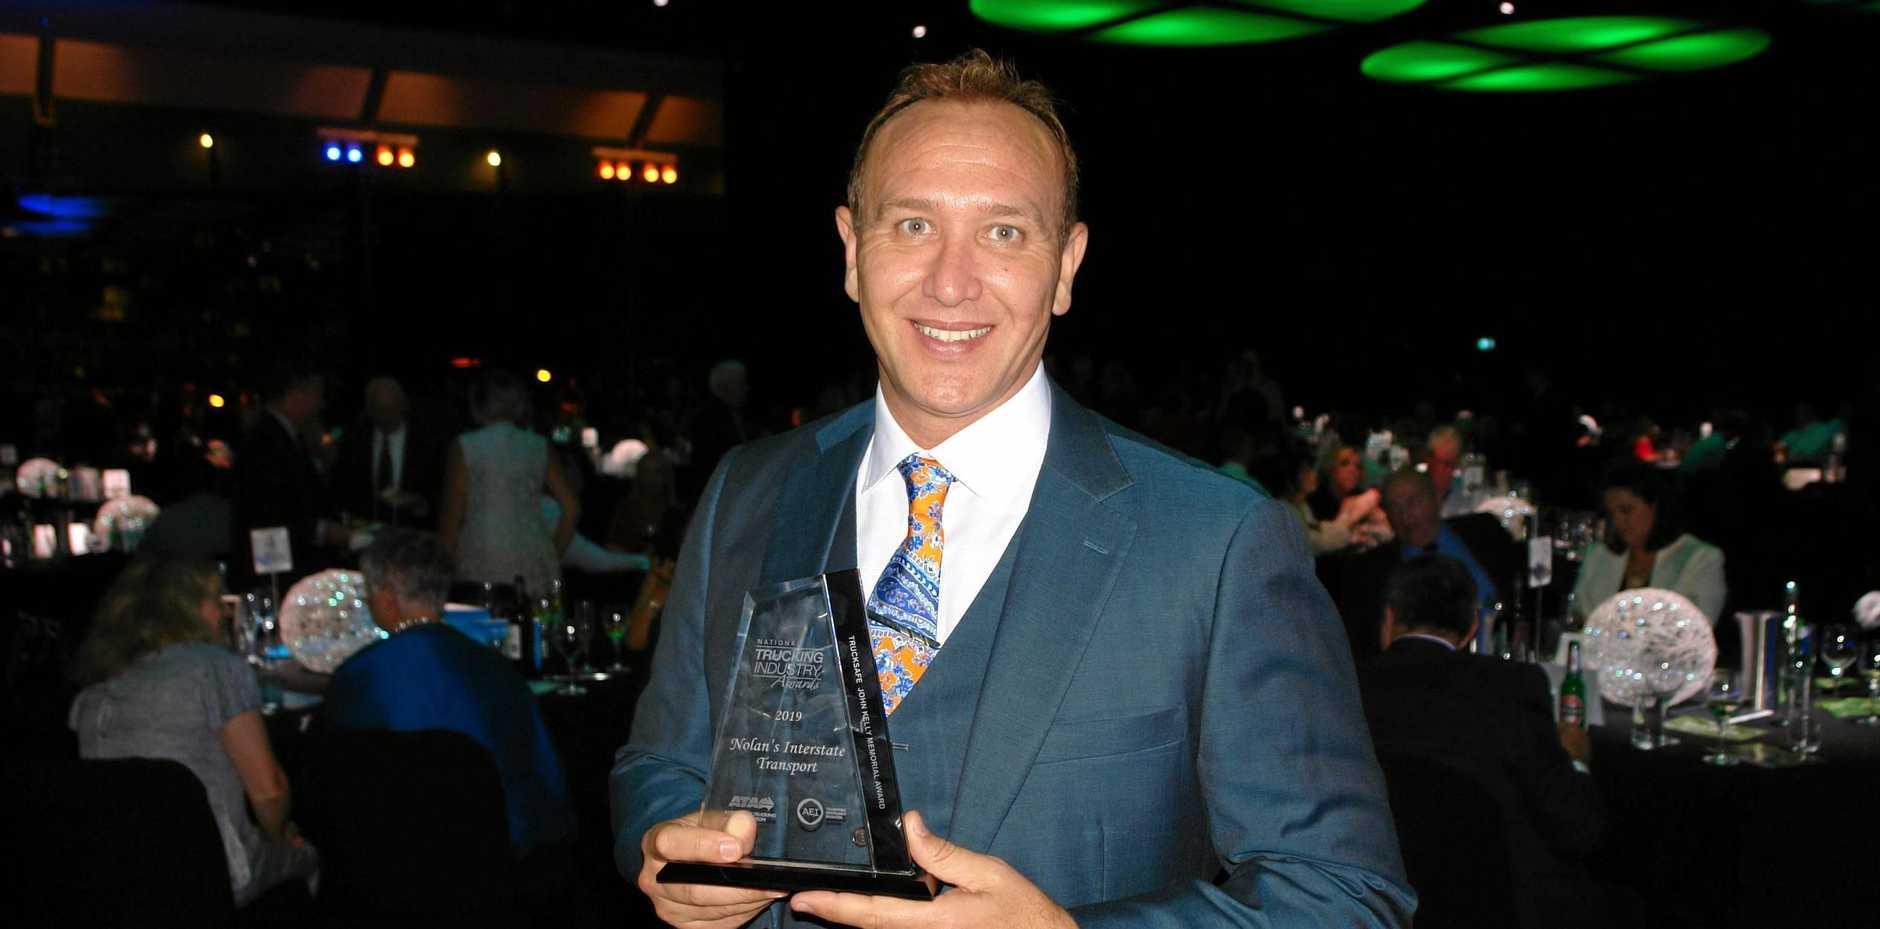 HONOUR: Darren Nolan accepts the TruckSafe John Kelly Award on behalf of his team.